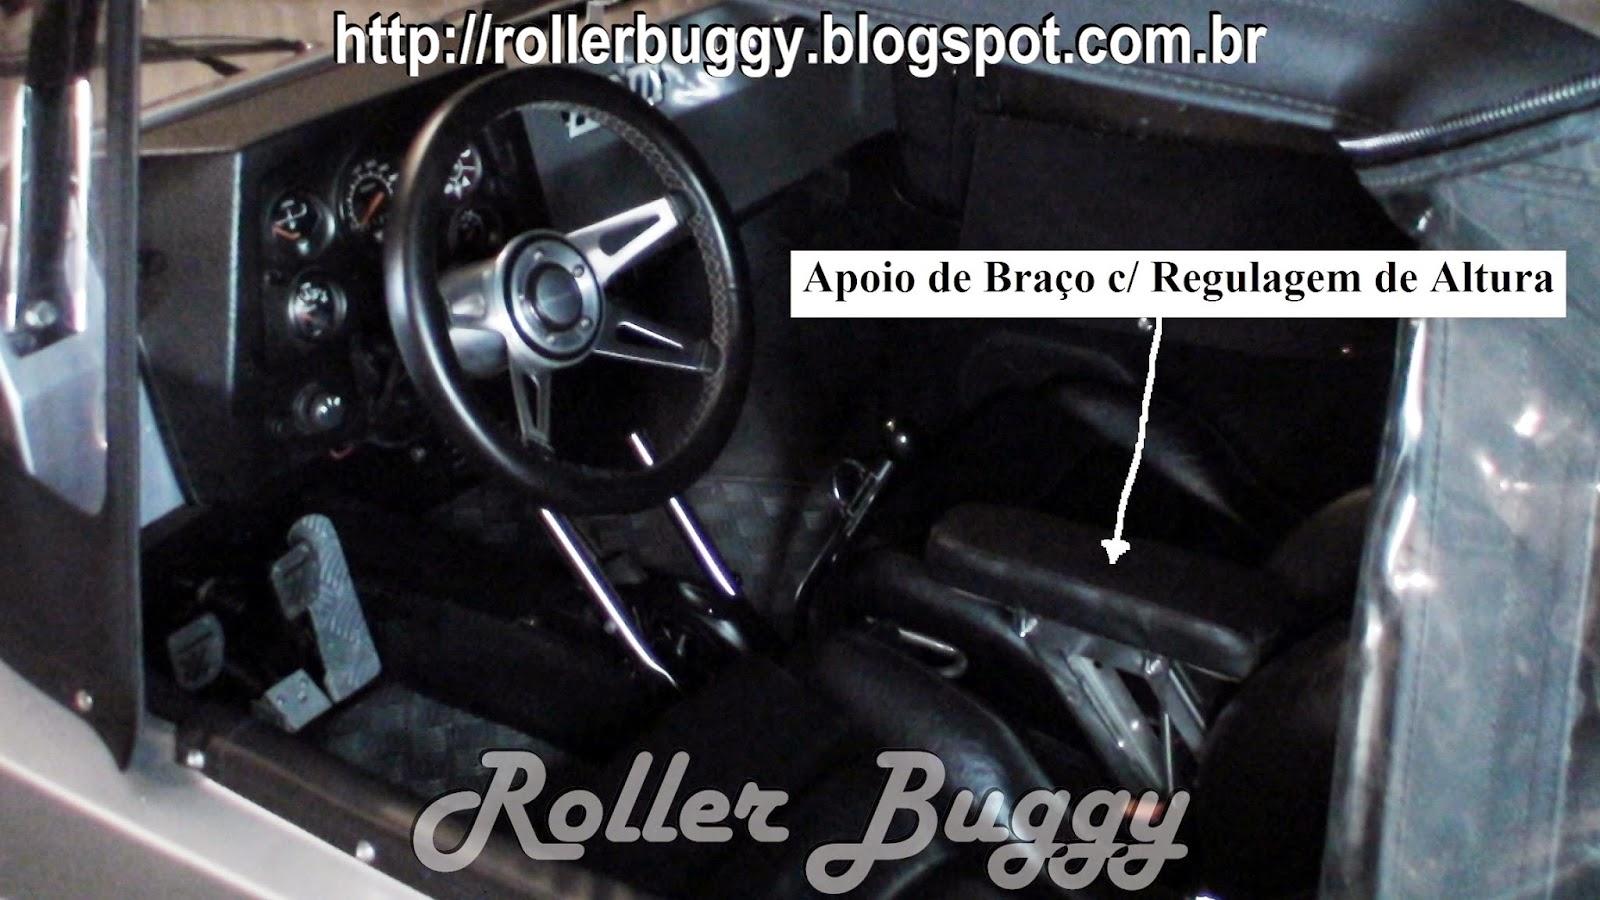 http://rollerbuggy.blogspot.com.br/2015/03/2014-agosto-conforto.html#more